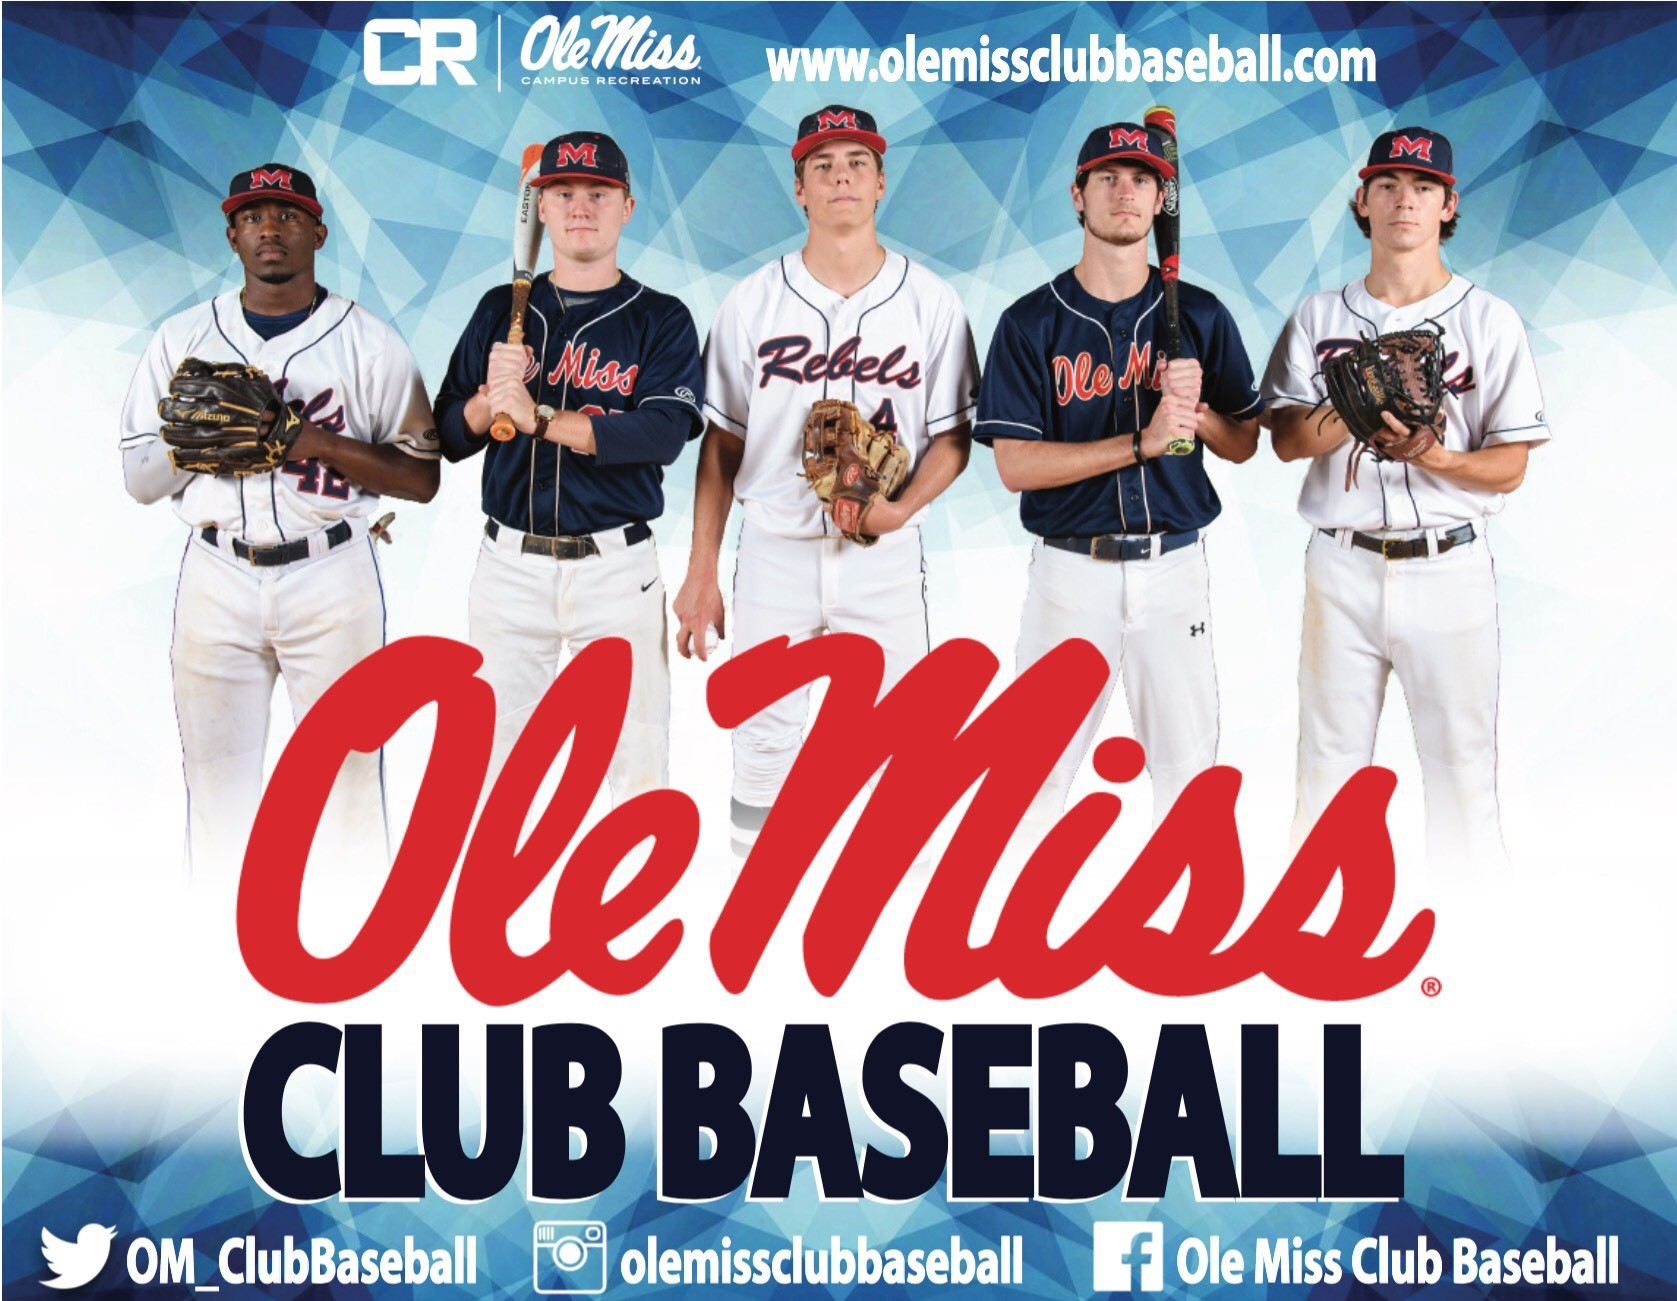 first rate e67af 1a2e1 Ole Miss Club Baseball